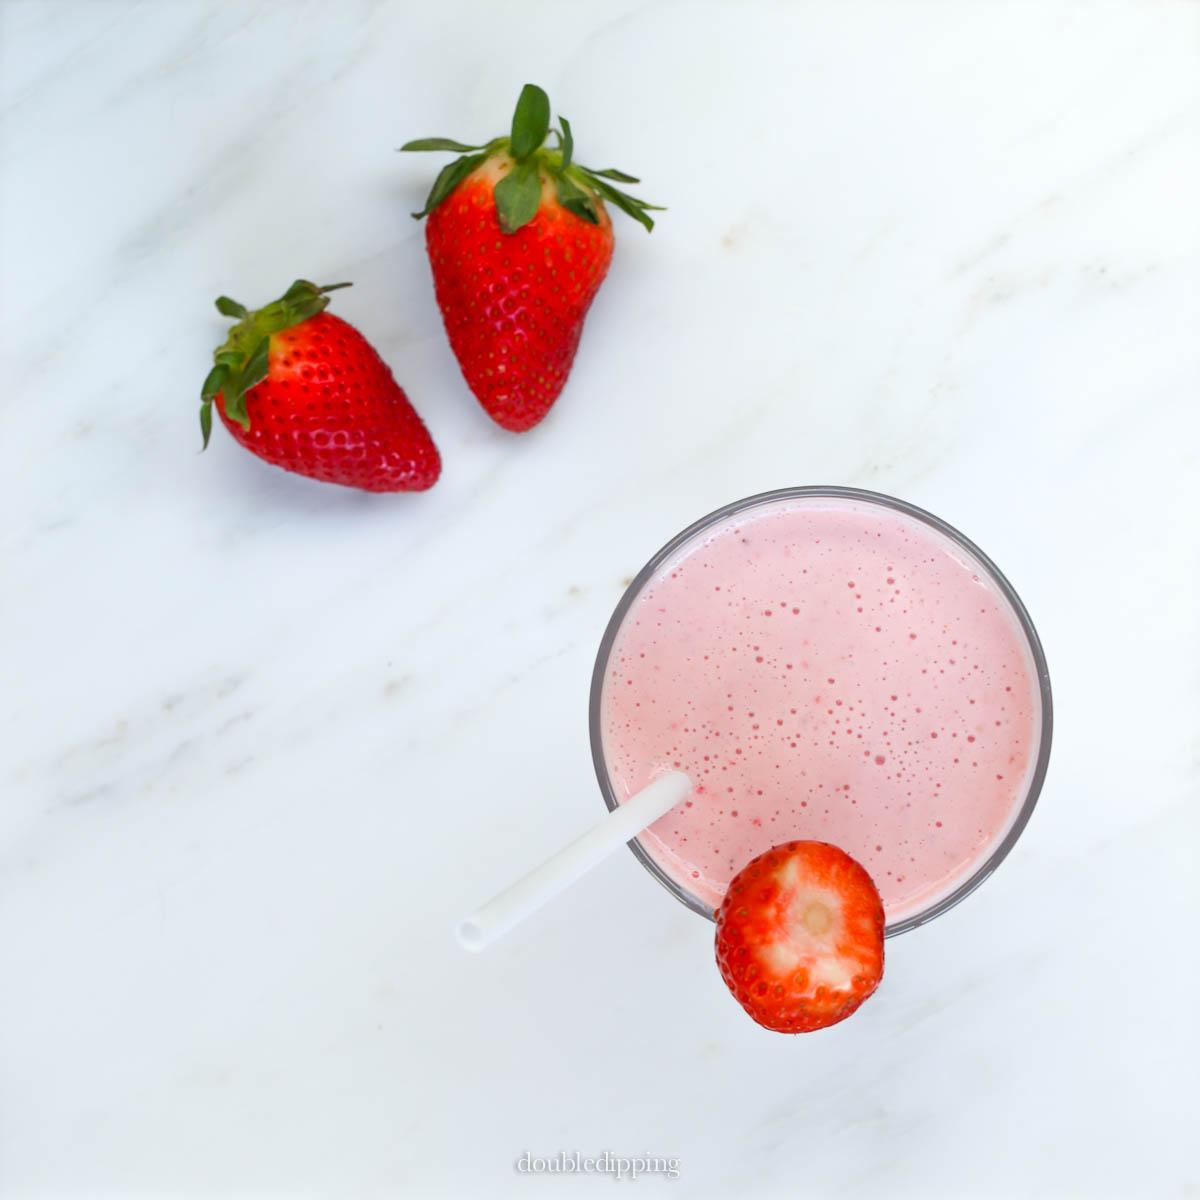 Strawberry Yoghurt Smoothie